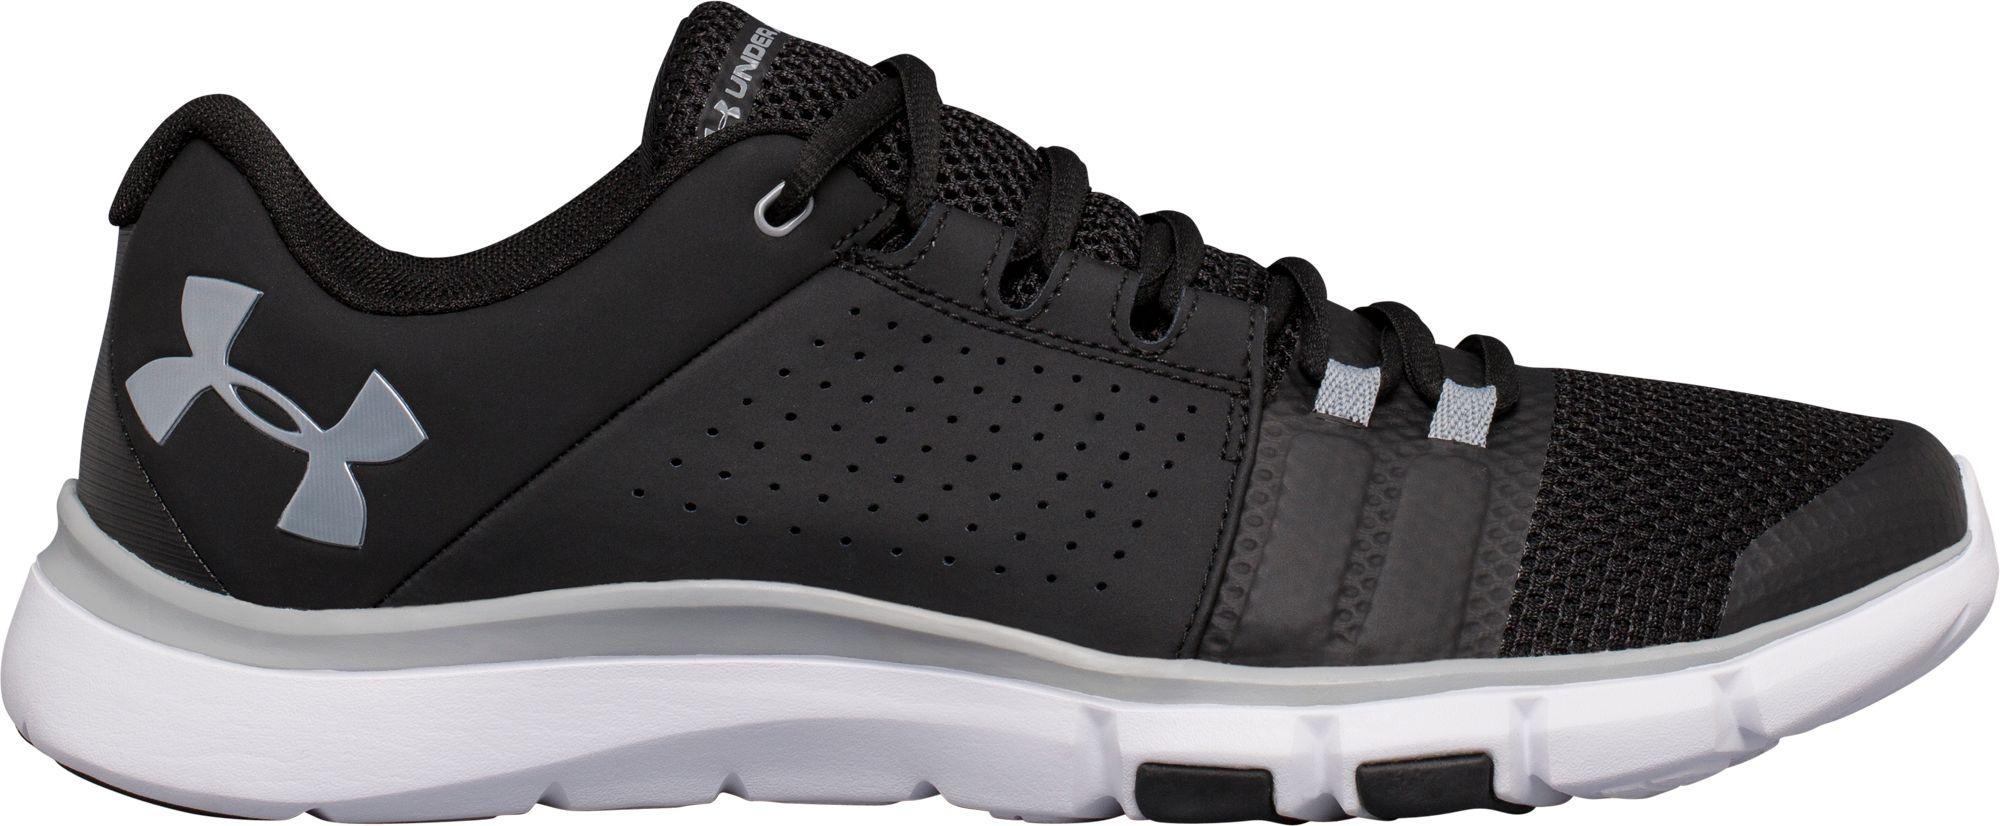 STRIVE 7 - Sports shoes - steel/black